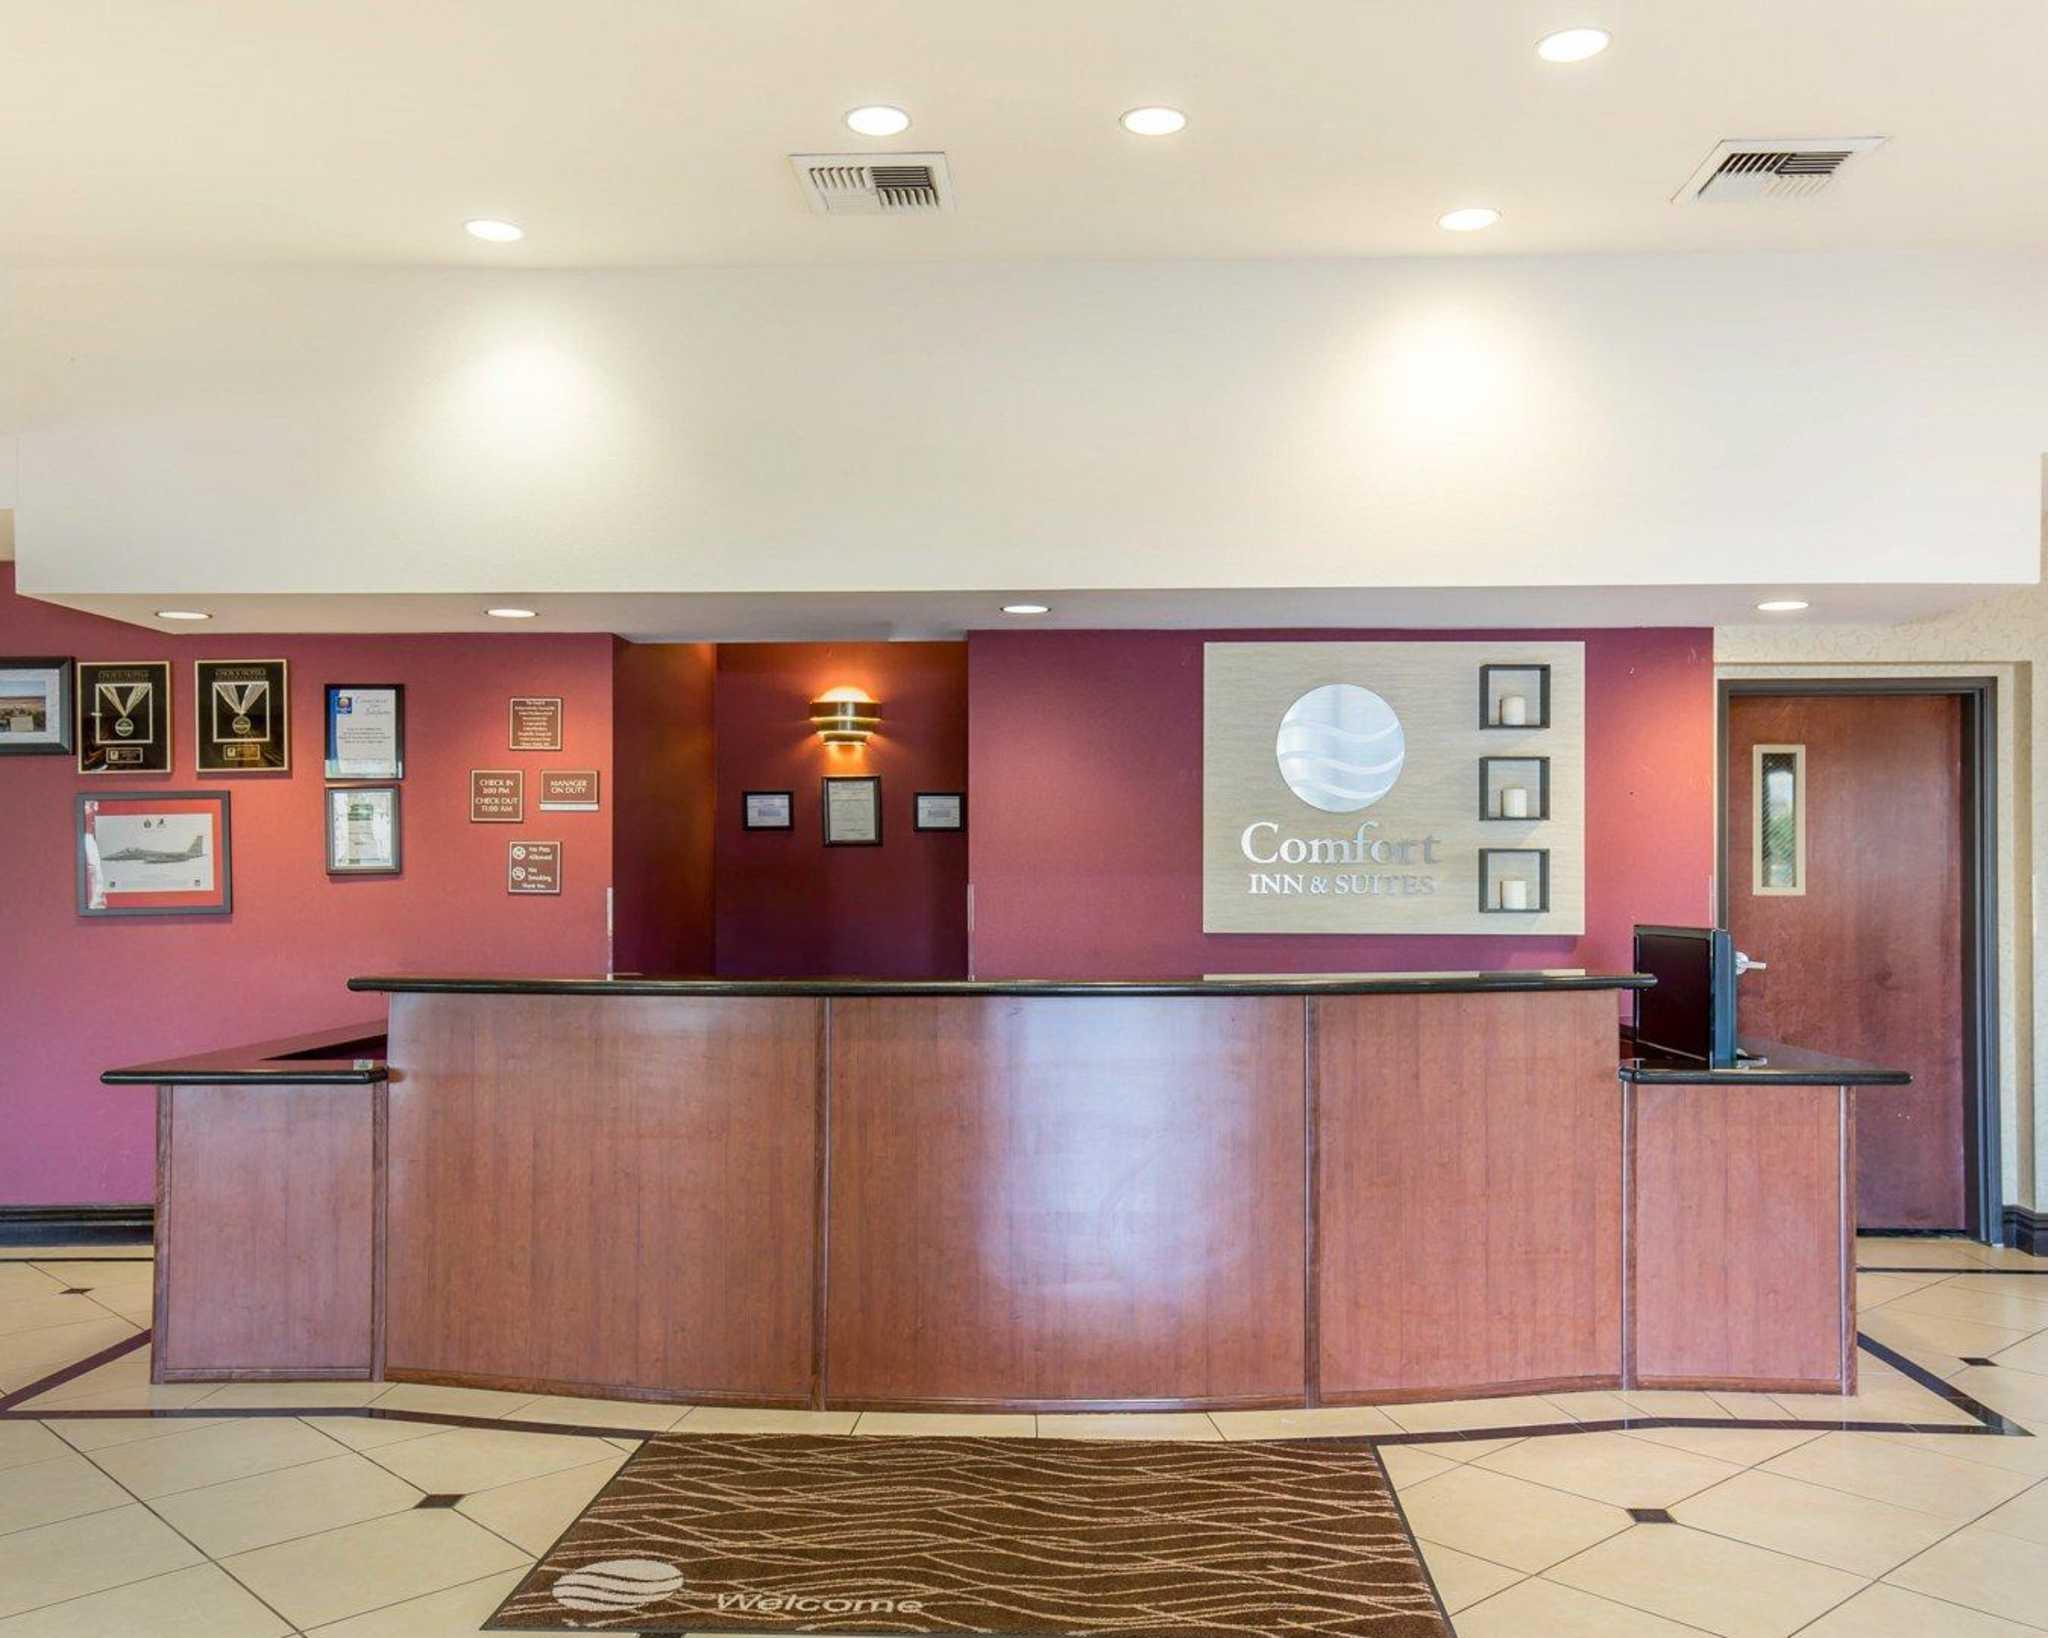 Comfort Inn & Suites Las Vegas - Nellis image 4